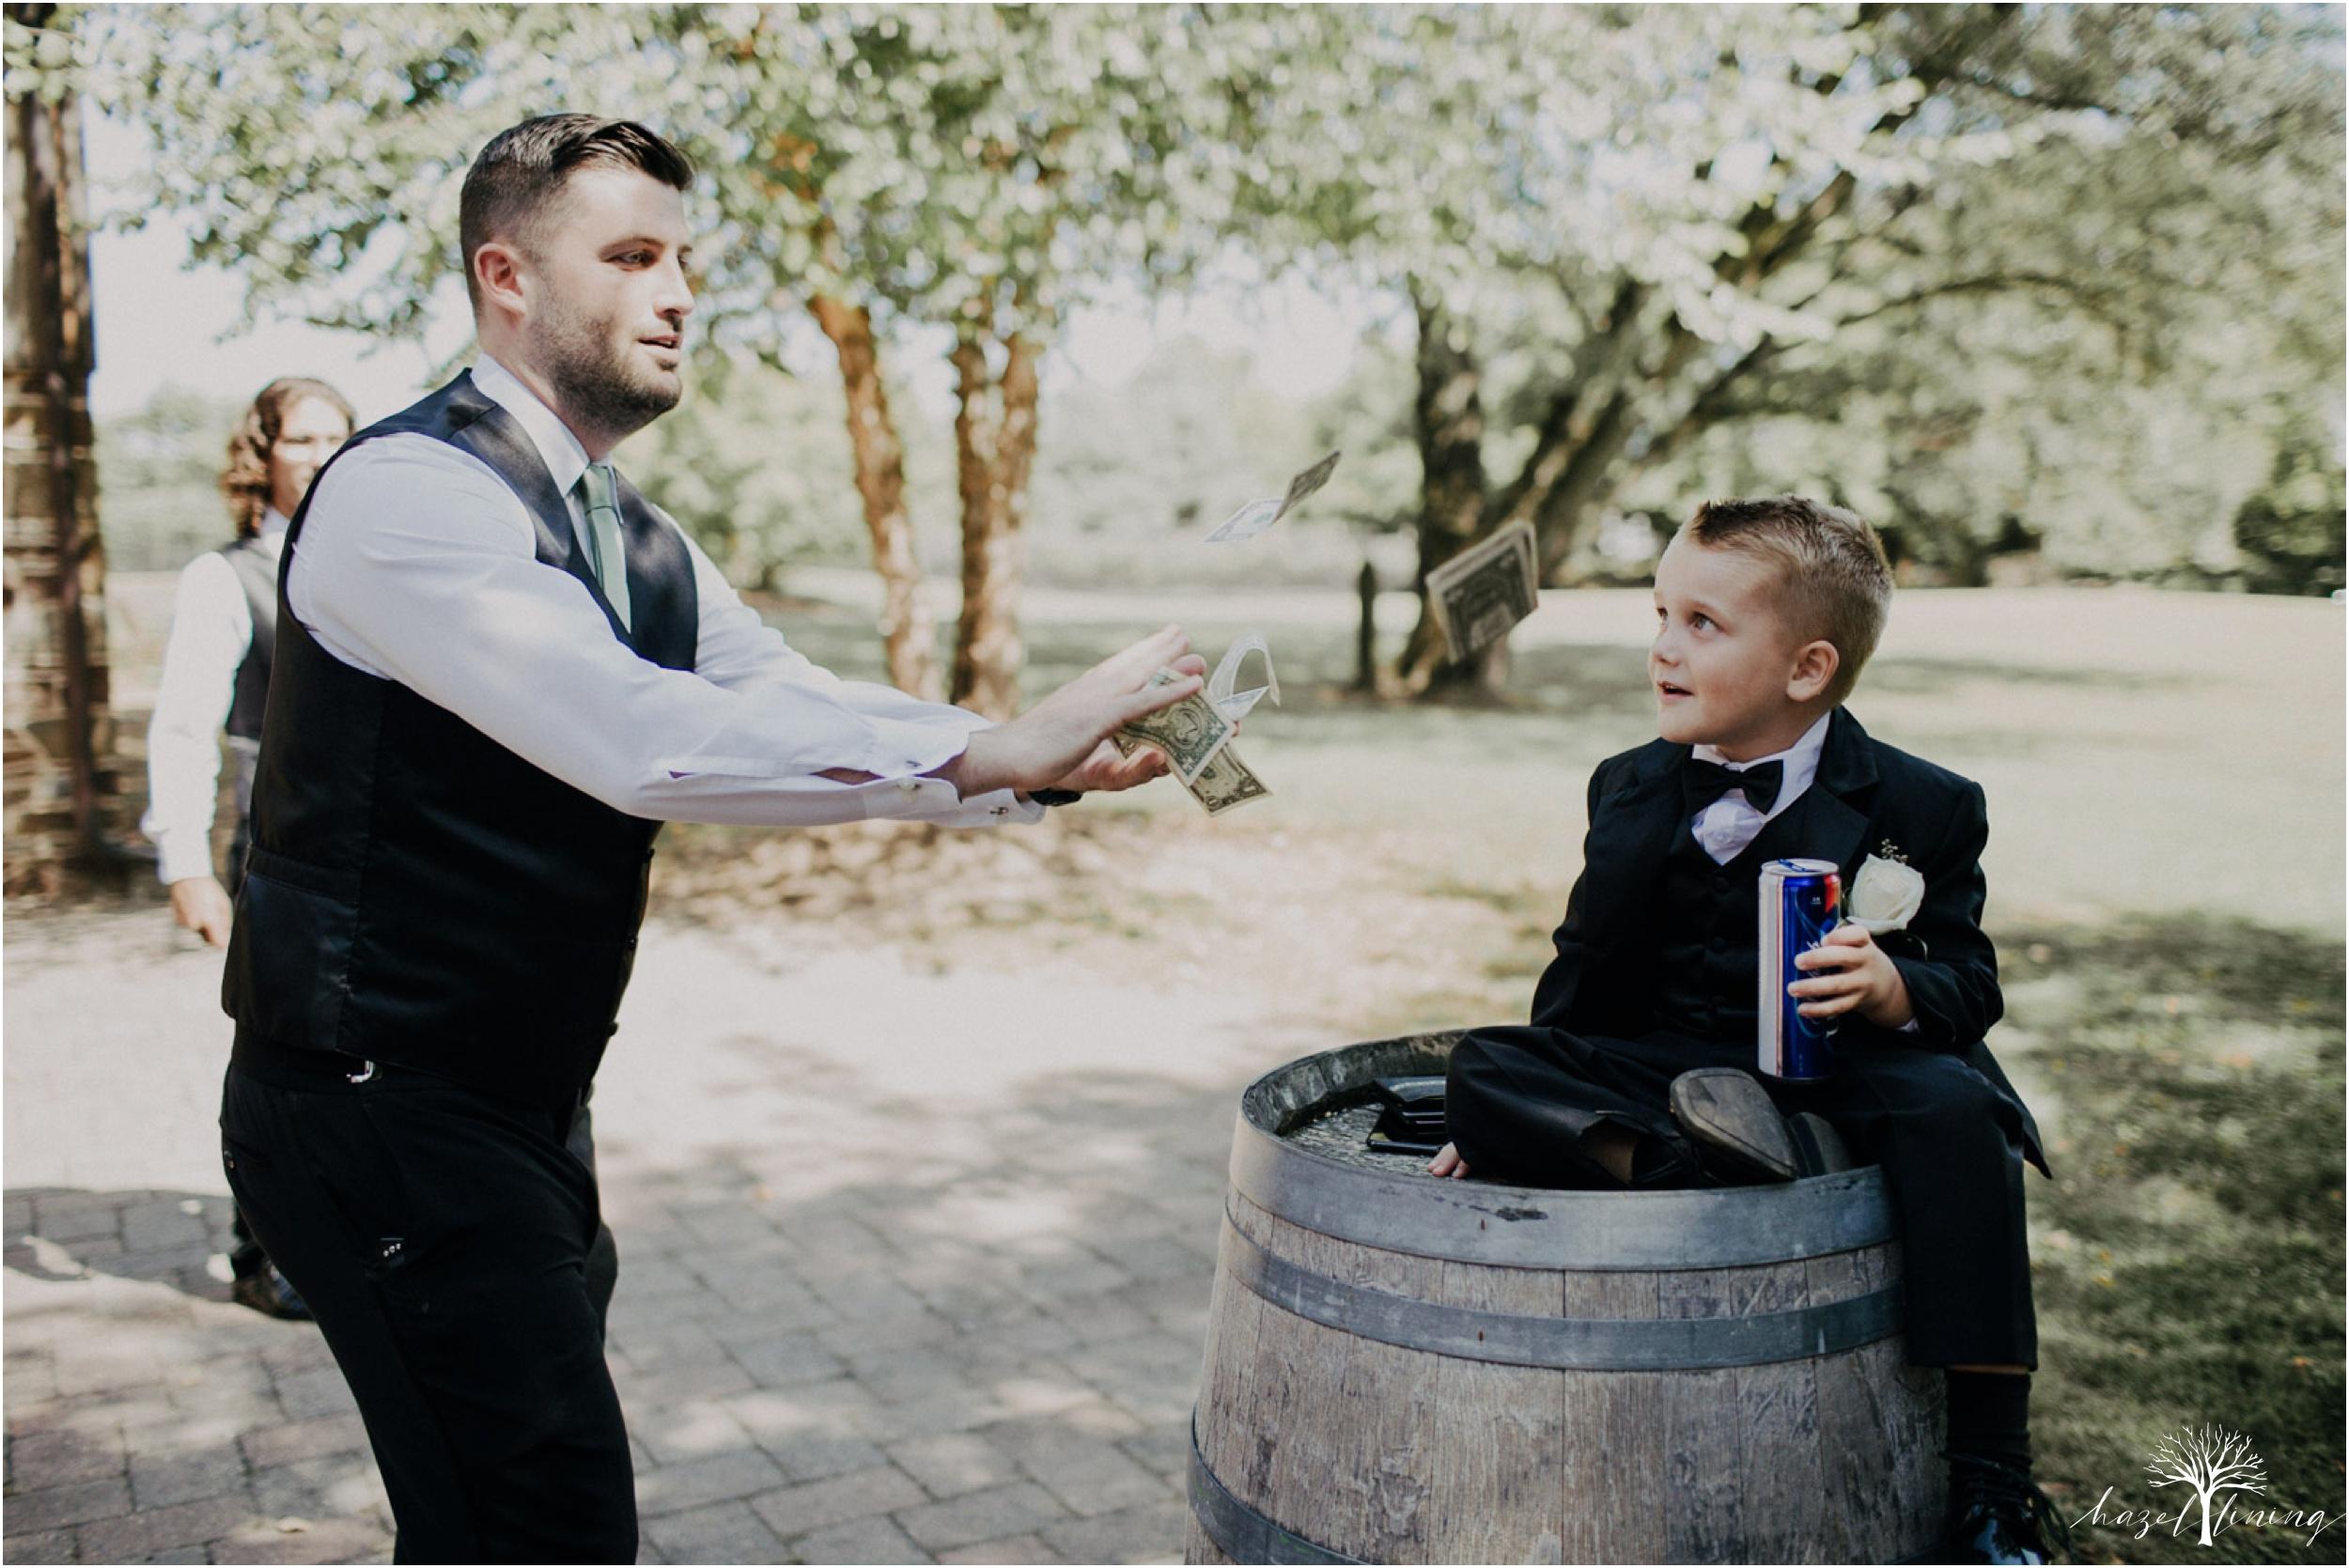 maureen-hepner-anthony-giordano-rose-bank-winery-newtow-pennsylvania-luxury-summer-wedding-hazel-lining-photography-destination-elopement-wedding-engagement-photography_0046.jpg